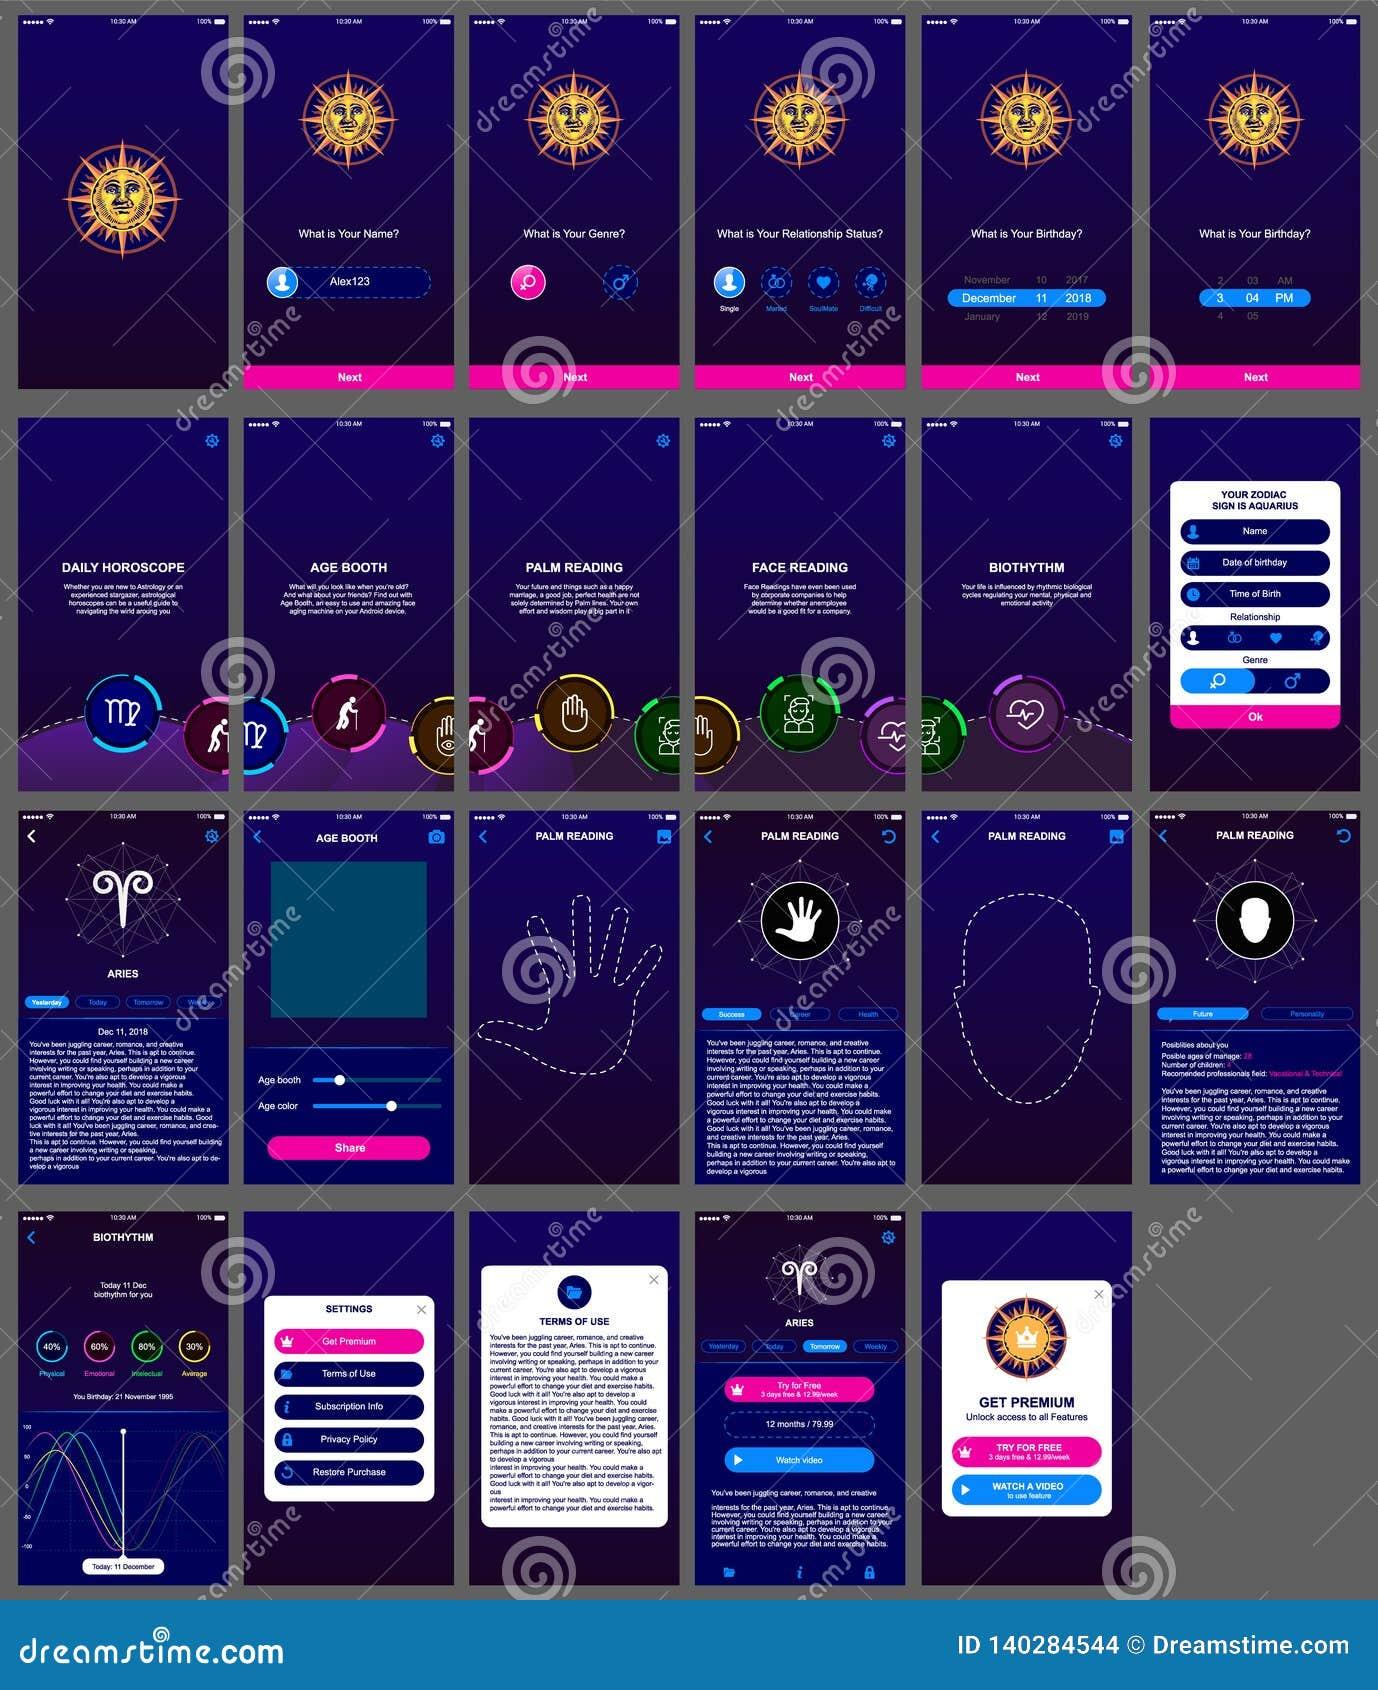 Horoscope Ui Design App Android Stock Illustration